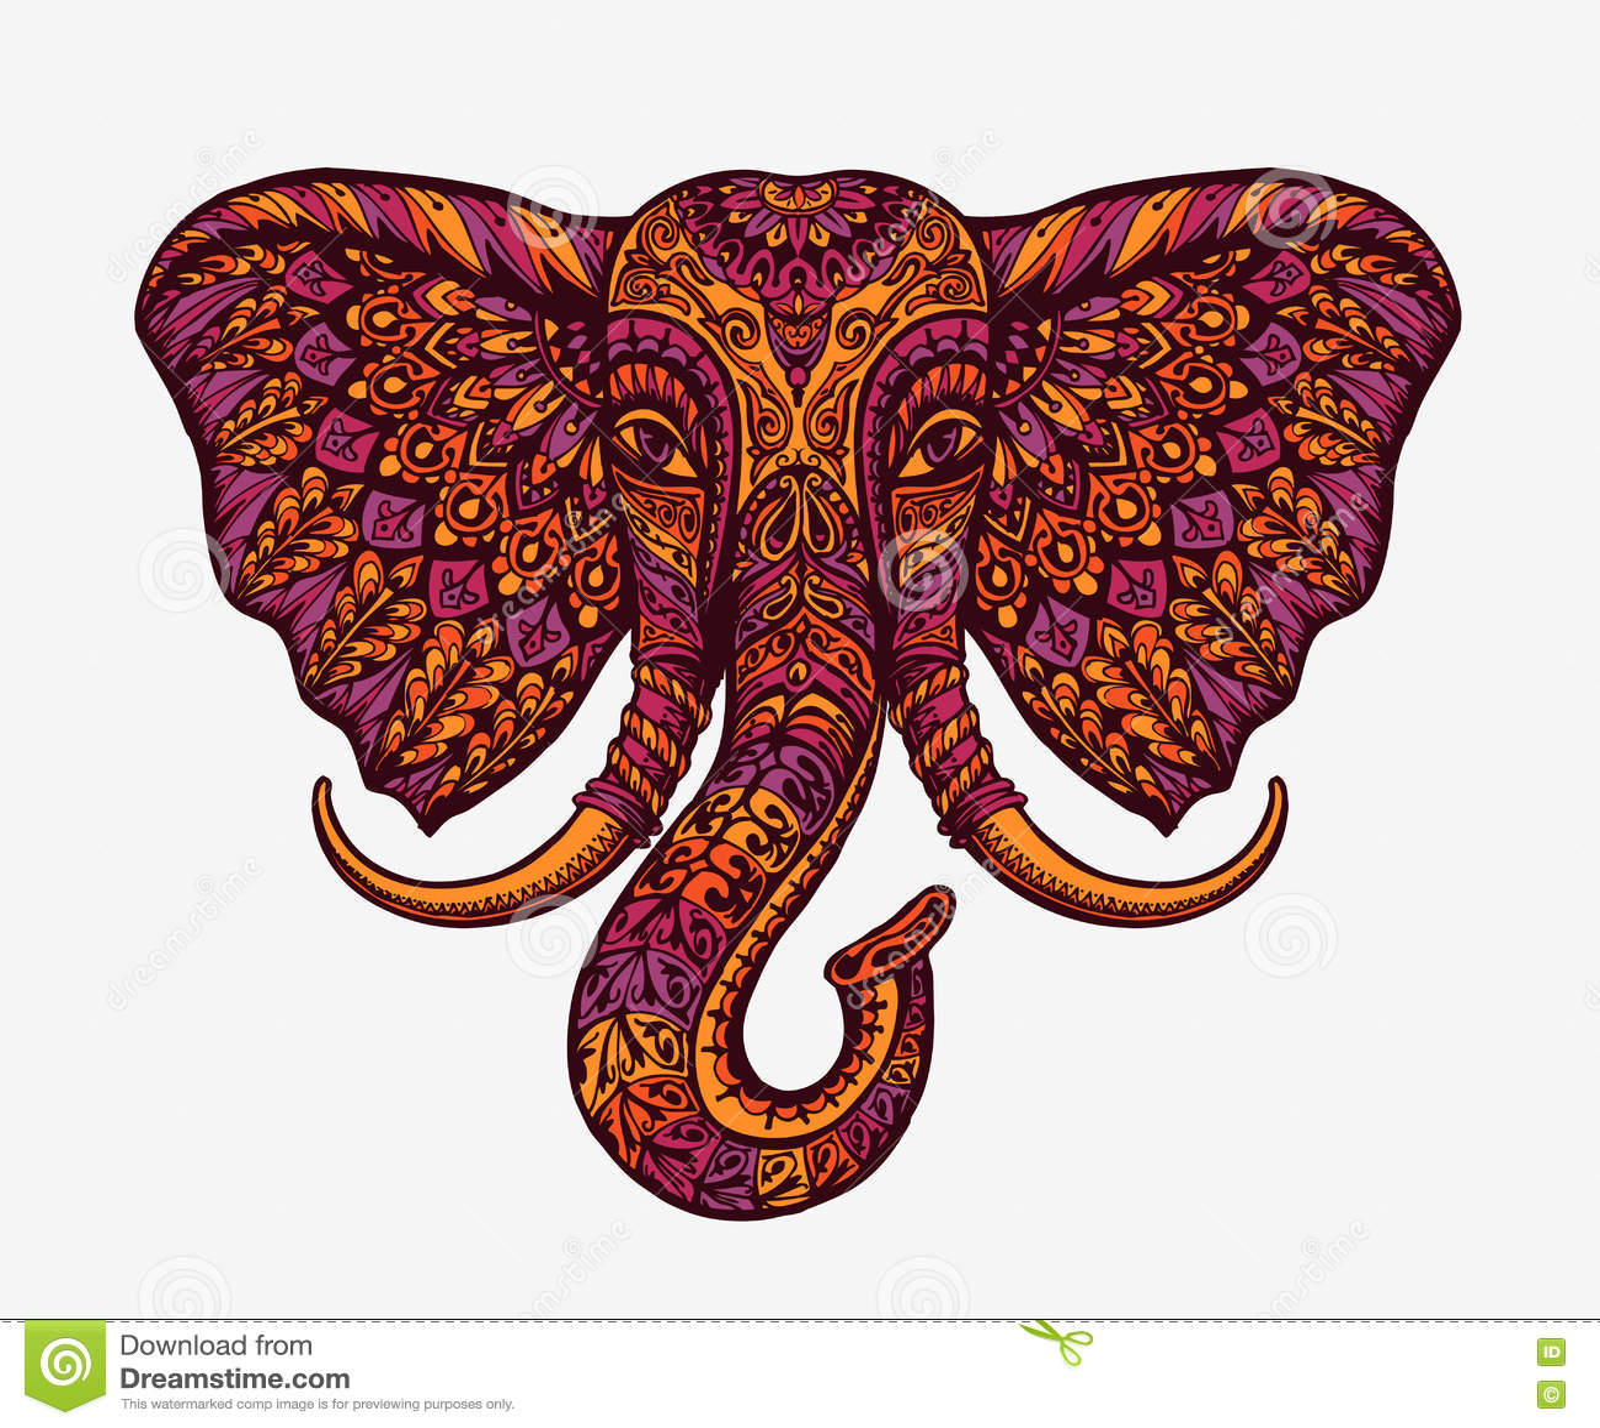 Festive indian elephant. Ethnic patterns. Vector illustration